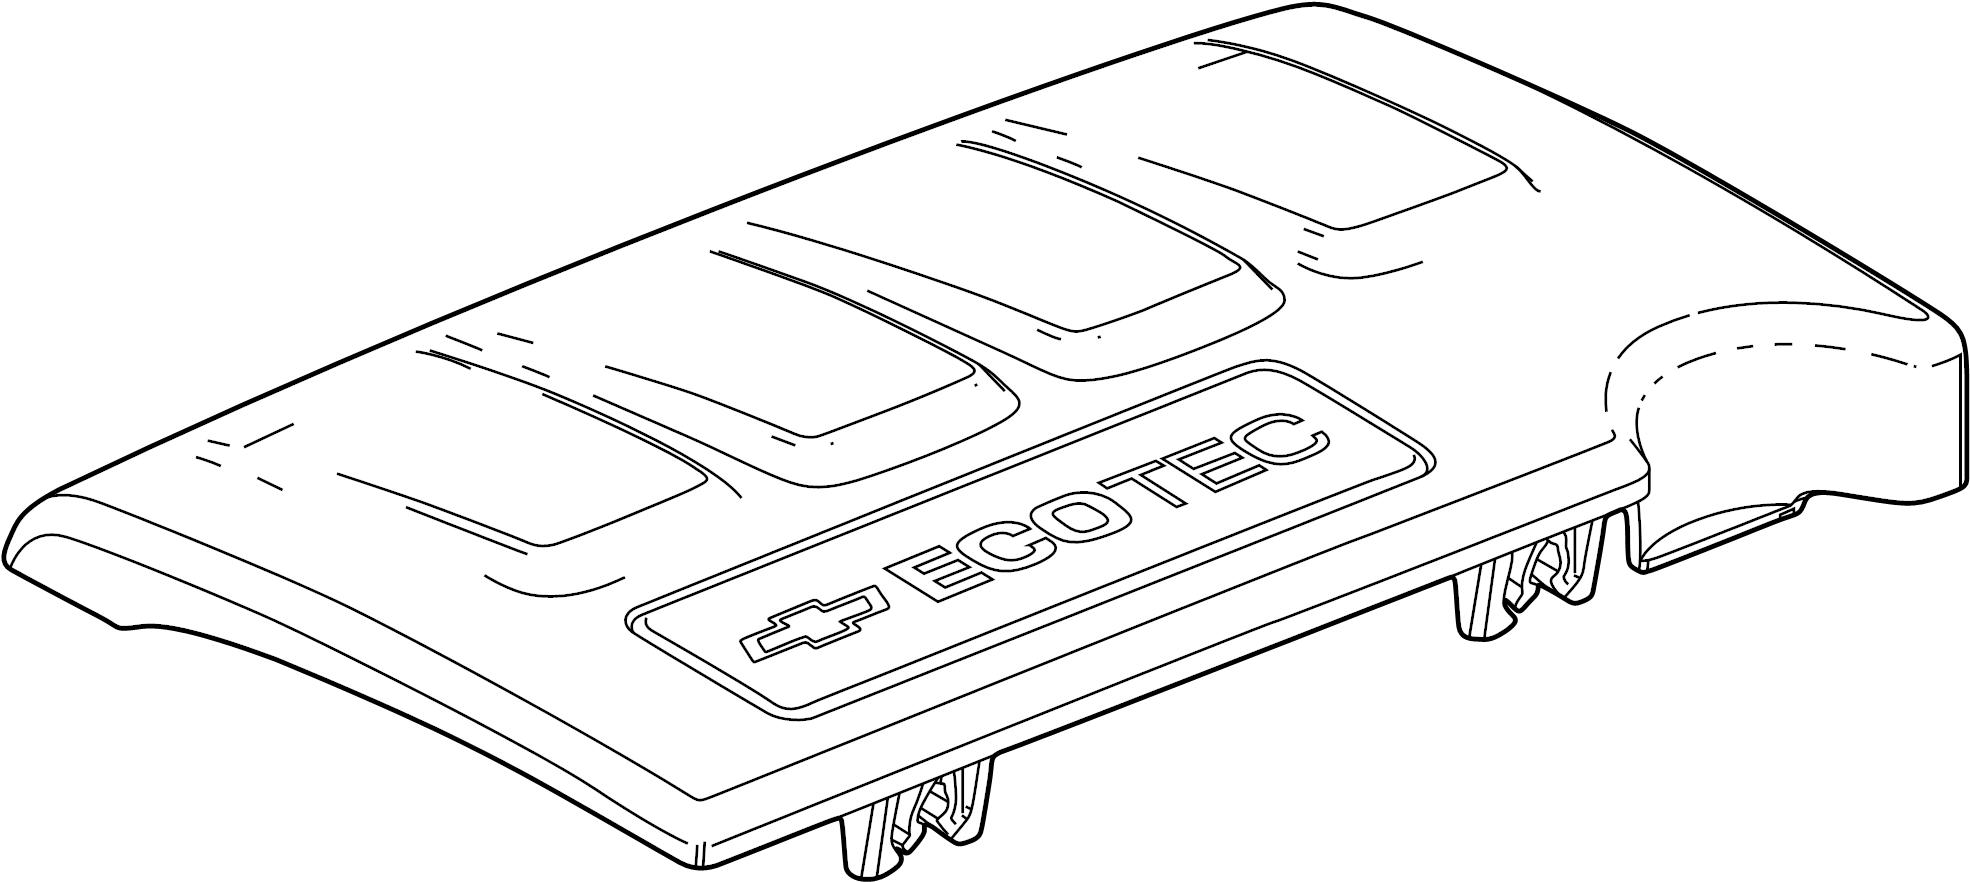 Chevrolet Cruze Emblem Engine Cover 1 4 Liter Turbo